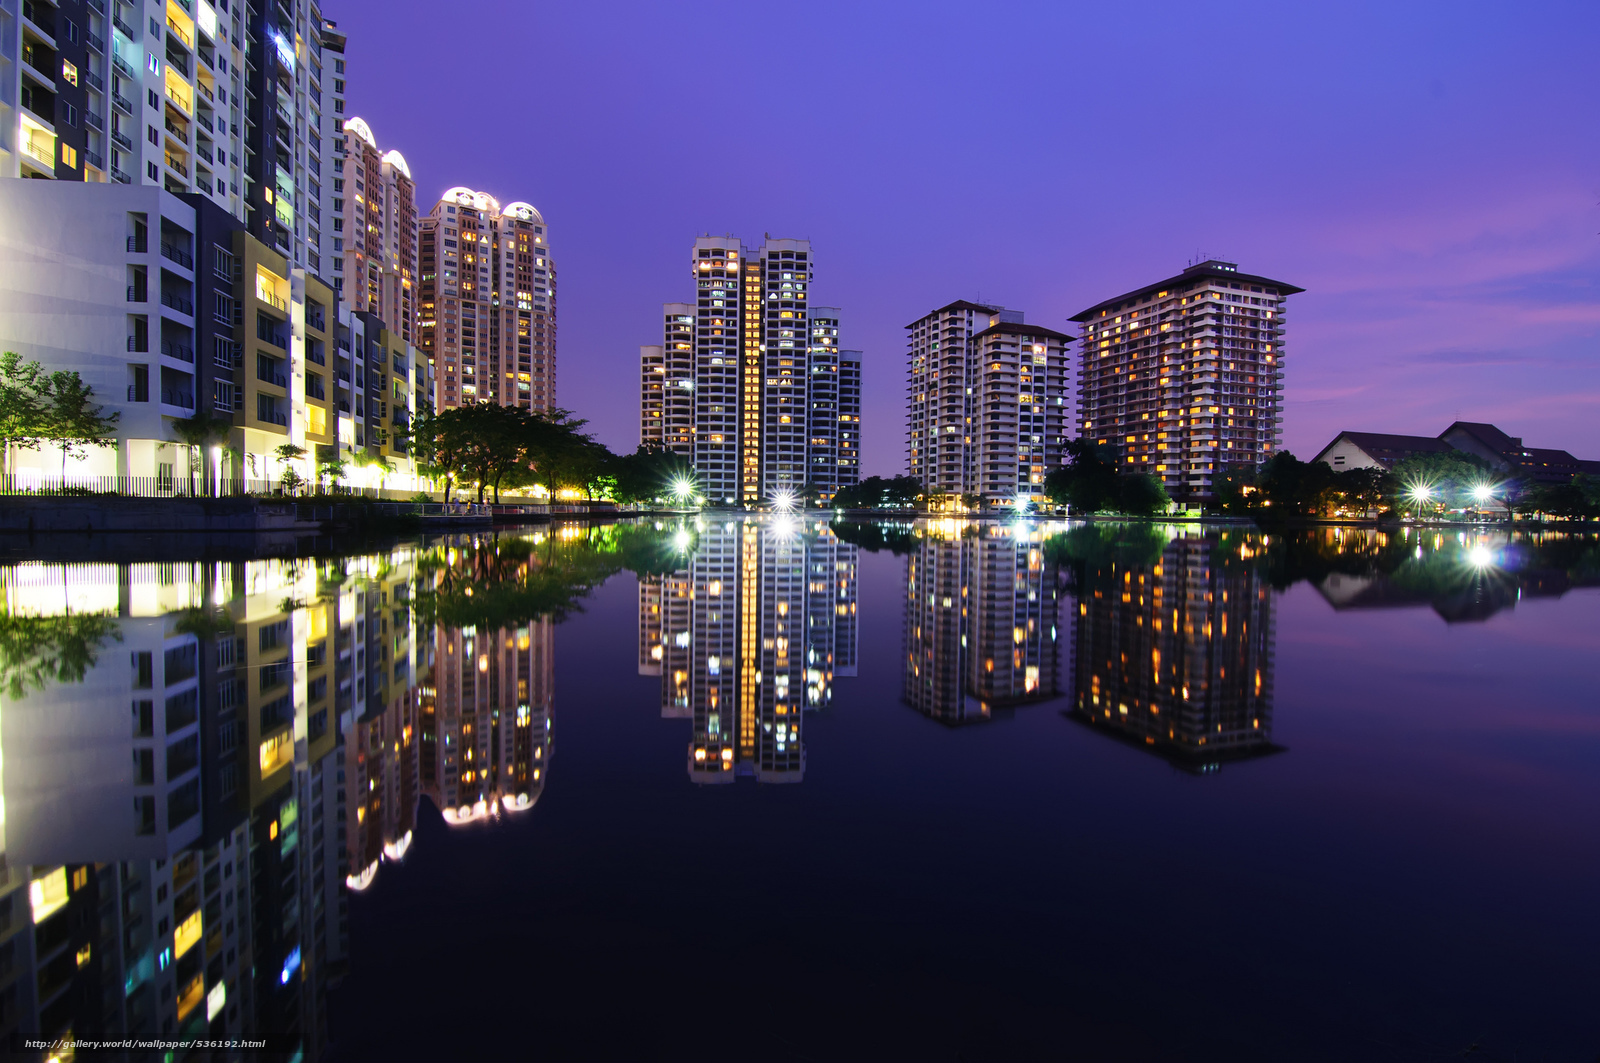 Tlcharger fond d 39 ecran malaisie kuala lumpur gratte ciel for Maison kuala lumpur